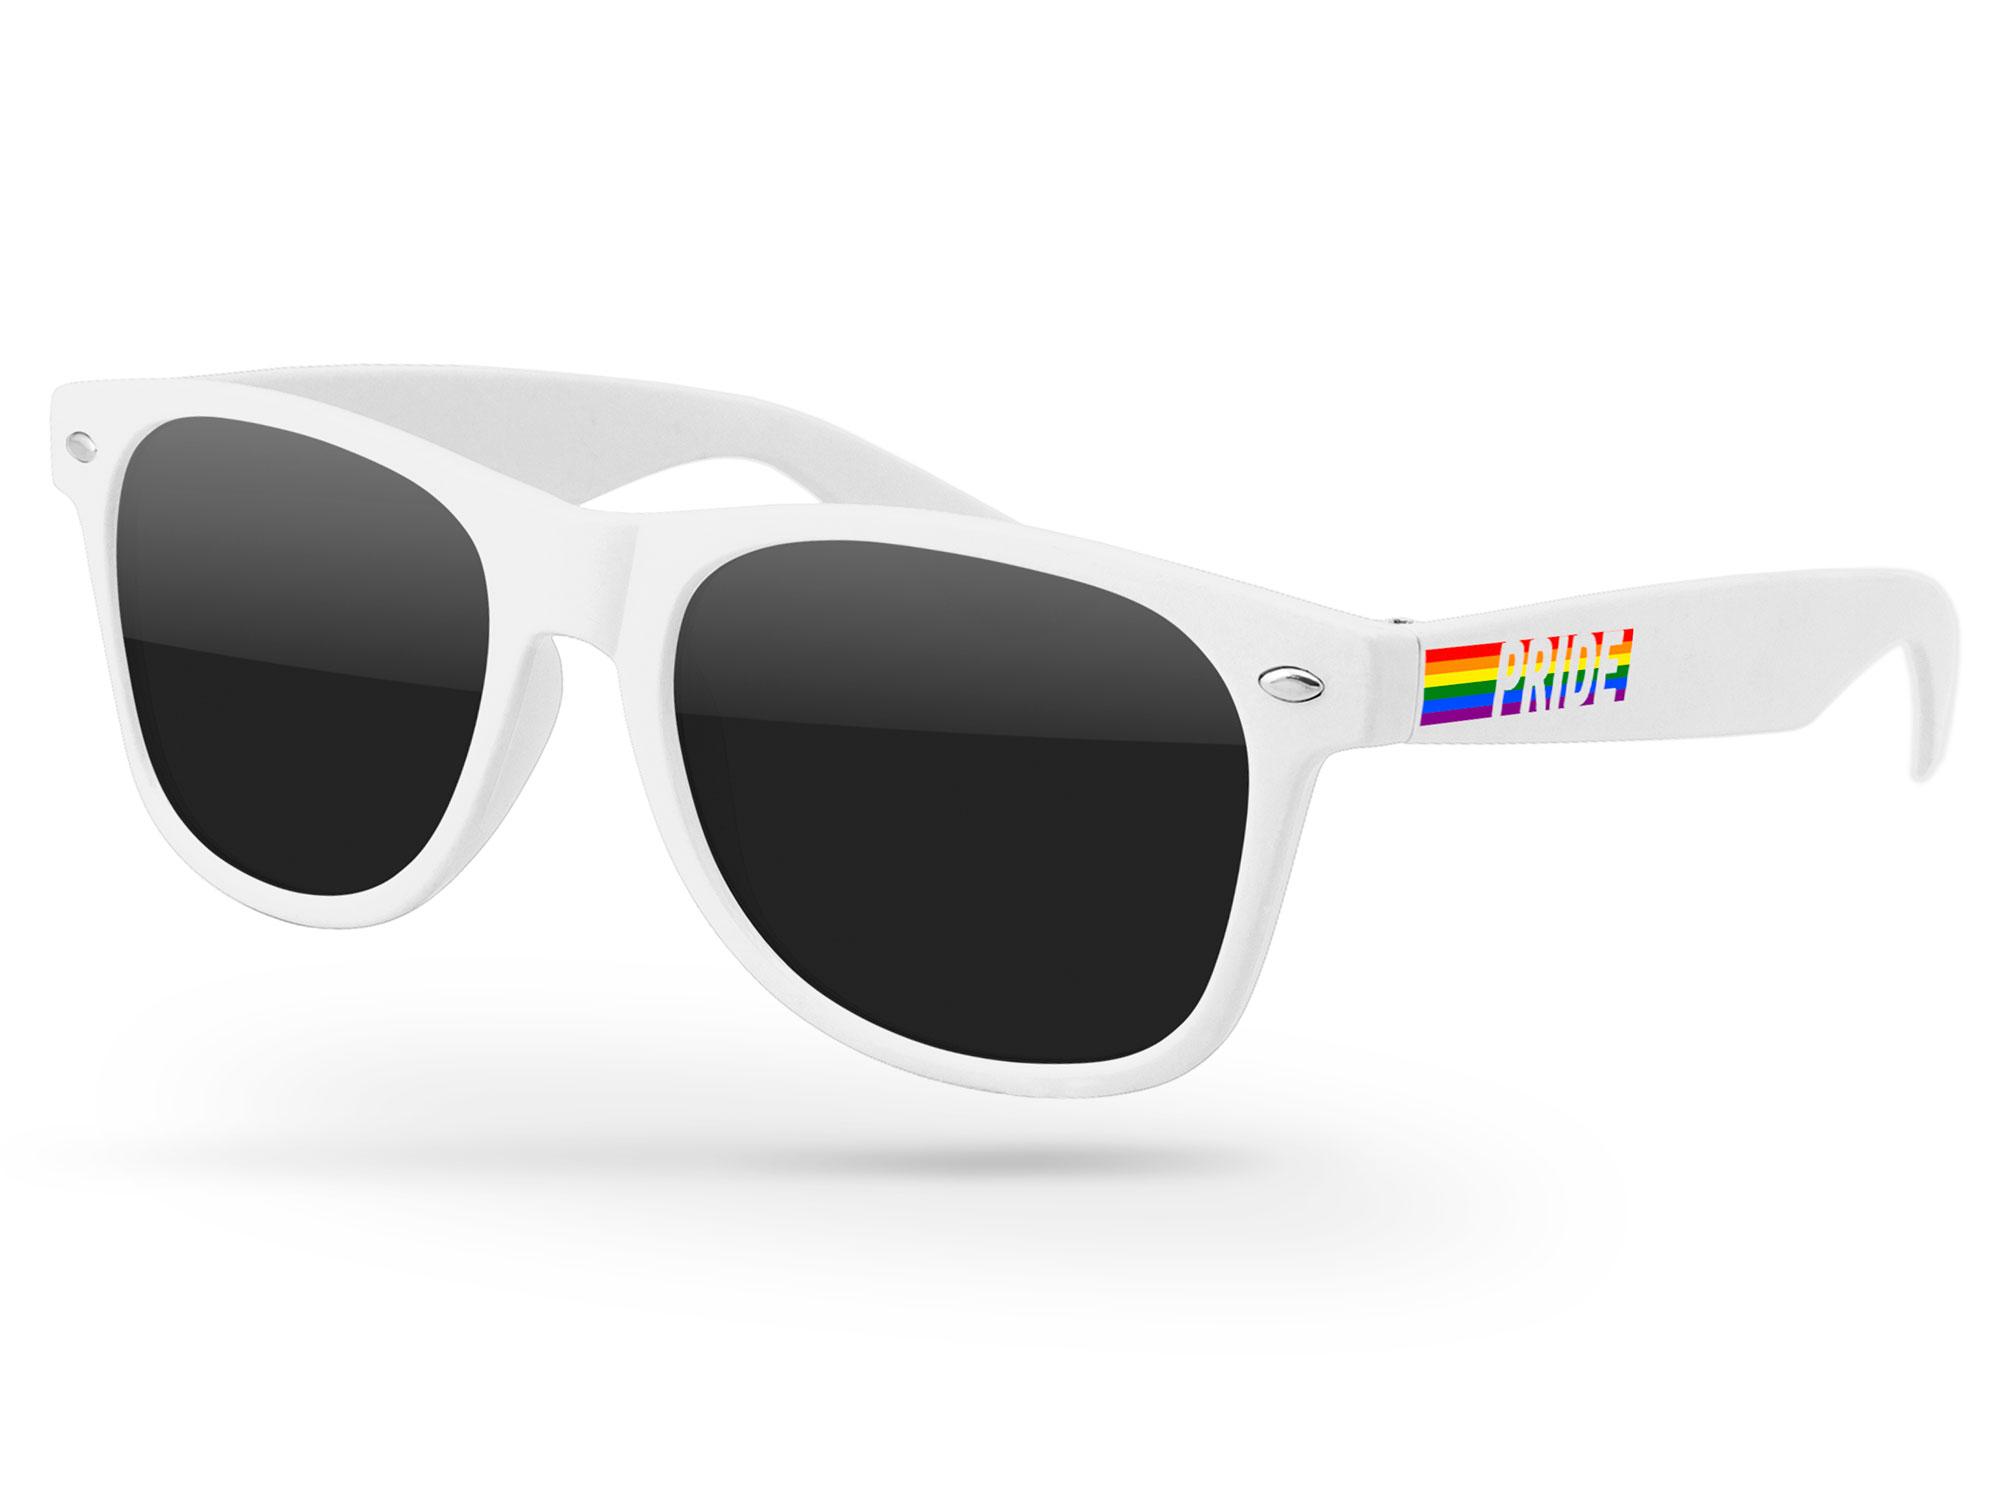 Pride Retro Promotional Sunglasses w/ full-color temple imprint